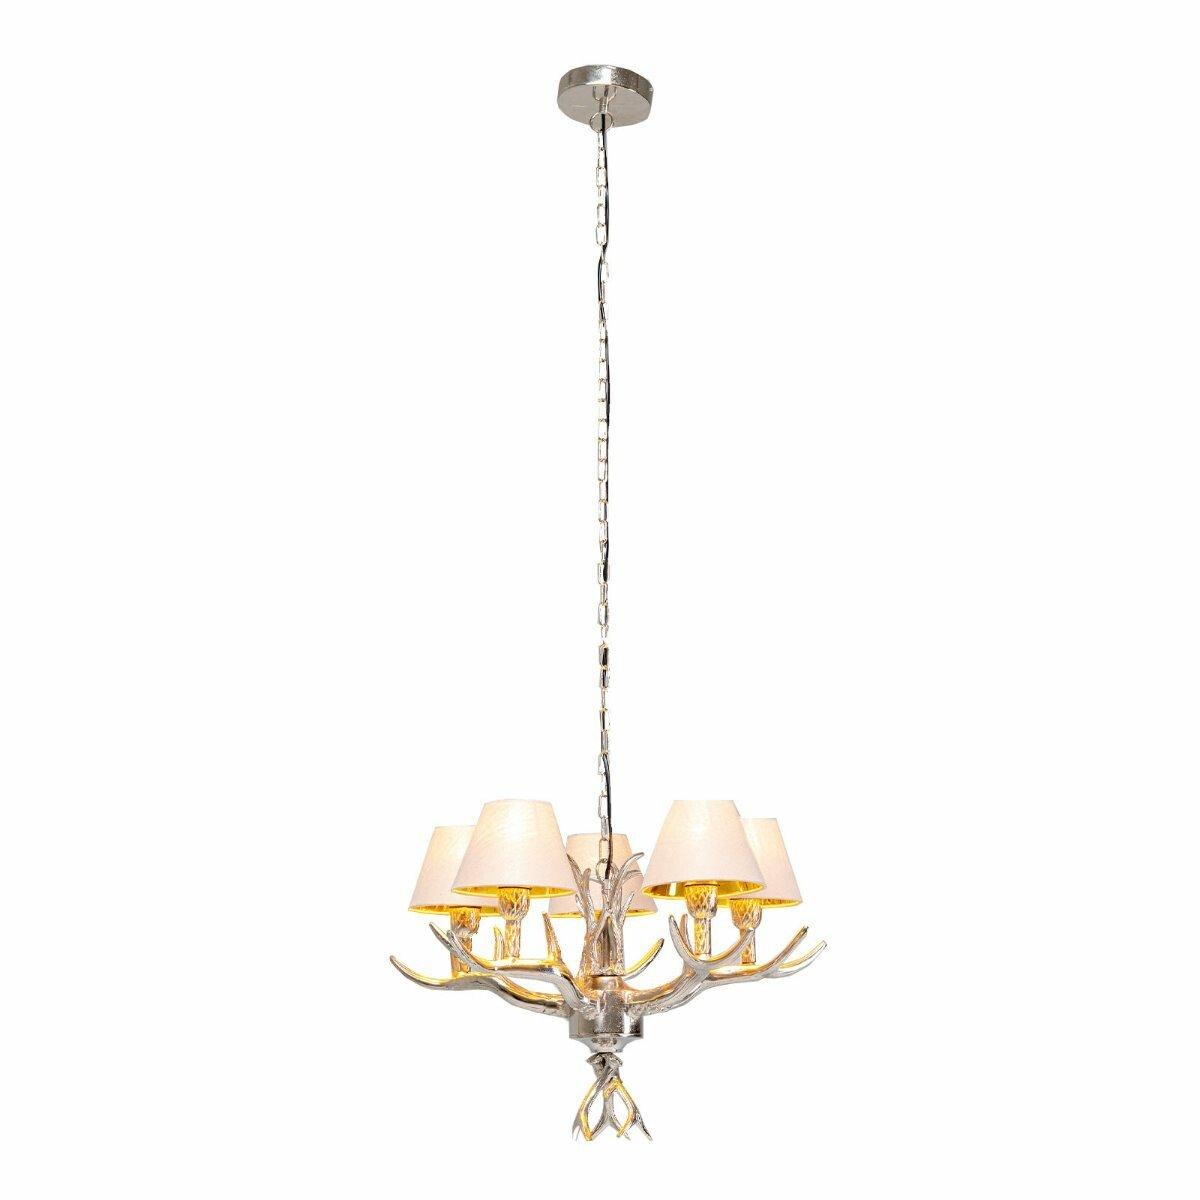 Kare Design hanglamp antler beige 35 x 57 x 57